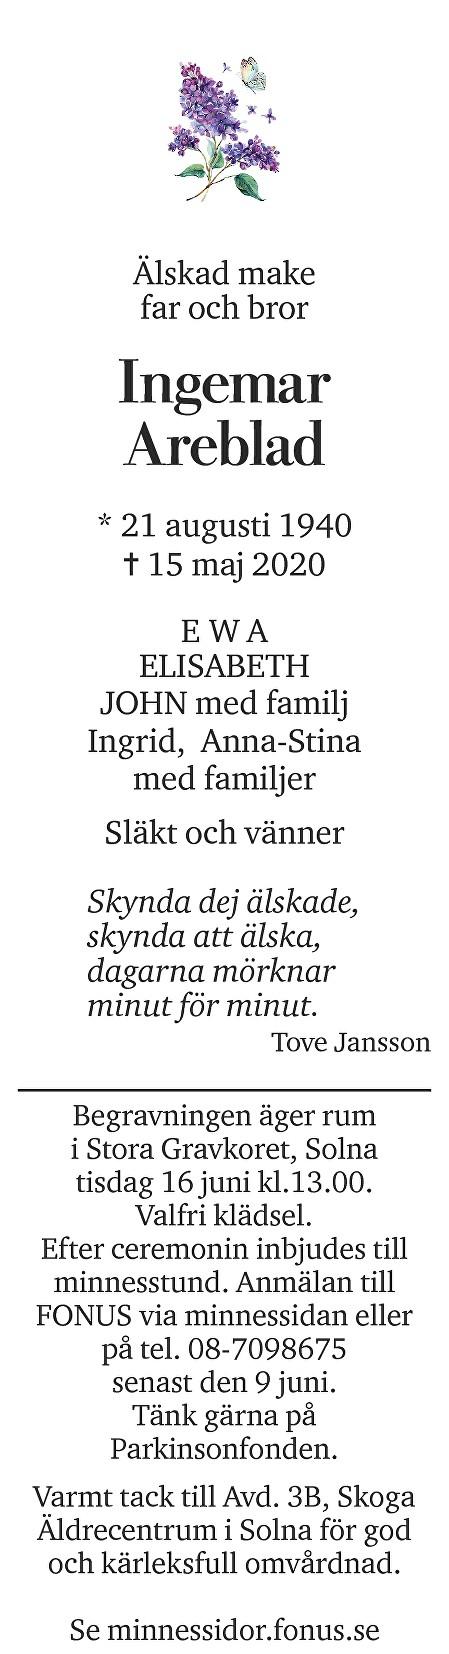 Ingemar Areblad Death notice